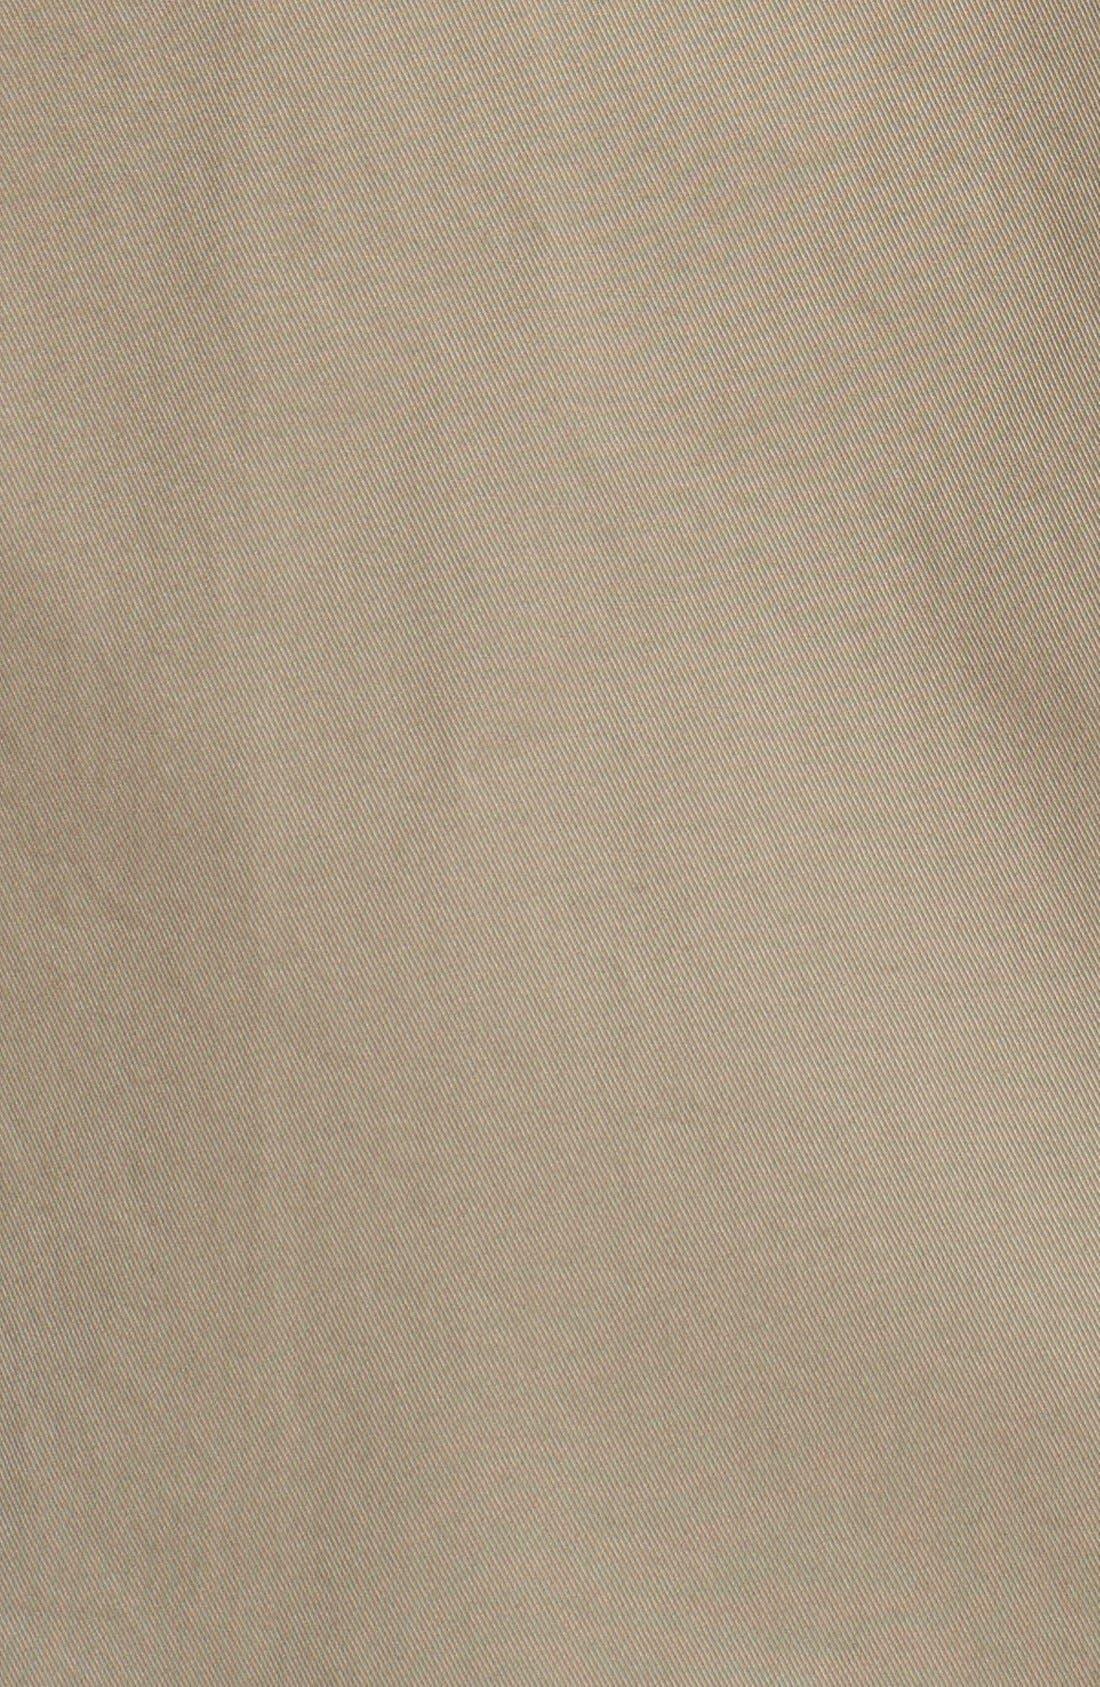 Alternate Image 3  - Victorinox Swiss Army® 'Bodman' Jacket